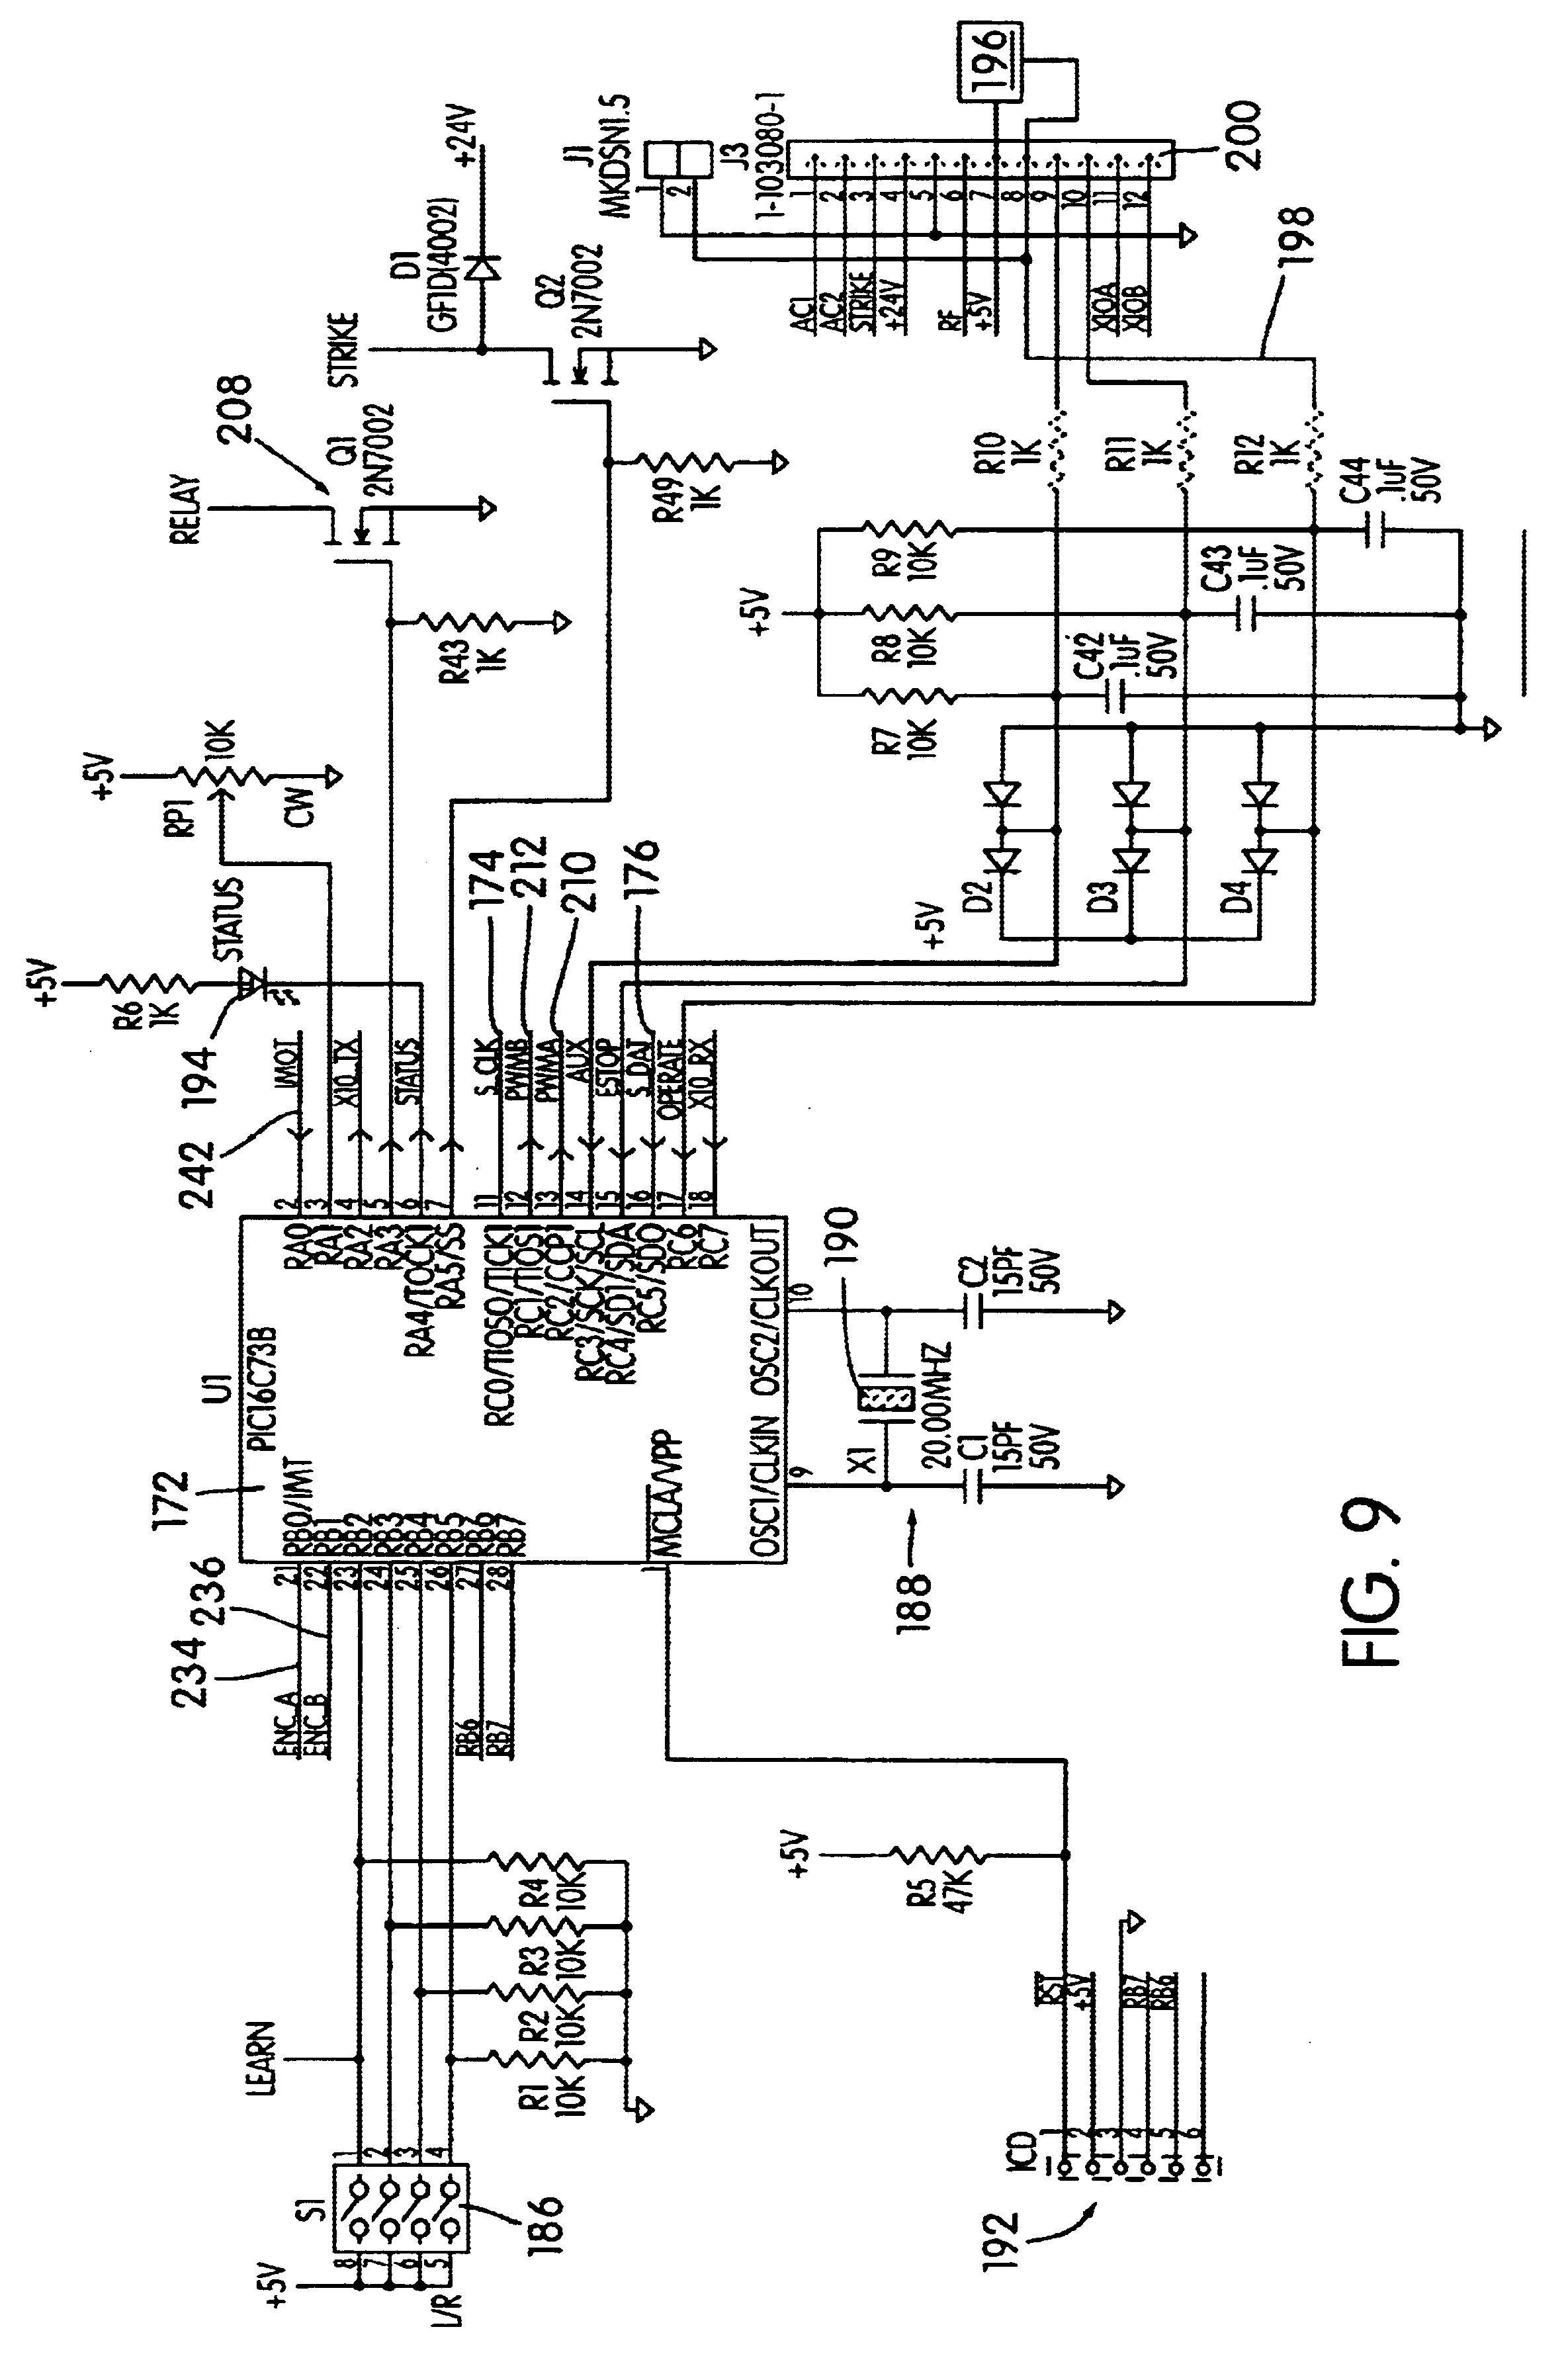 Besam Automatic Sliding Door Wiring Diagram